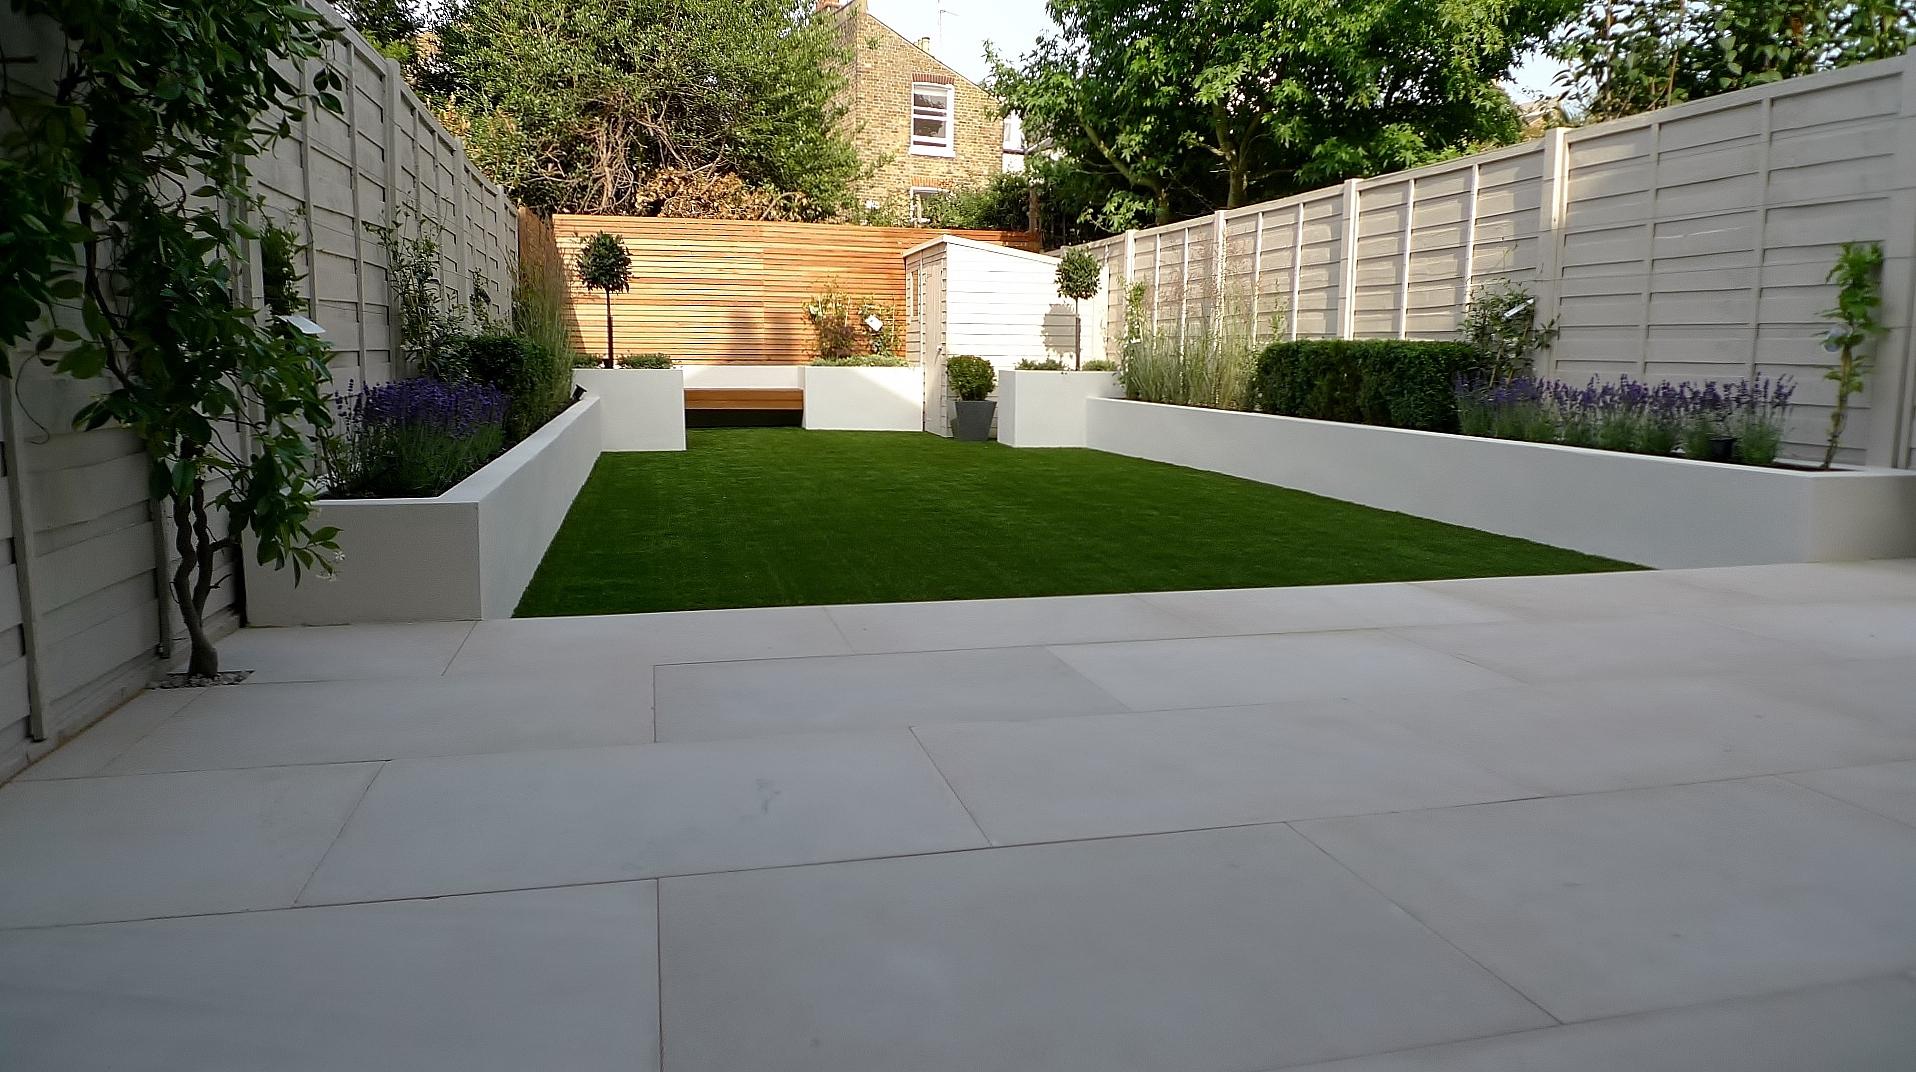 Sandstone | London Garden Design on Modern Small Patio Ideas id=94067